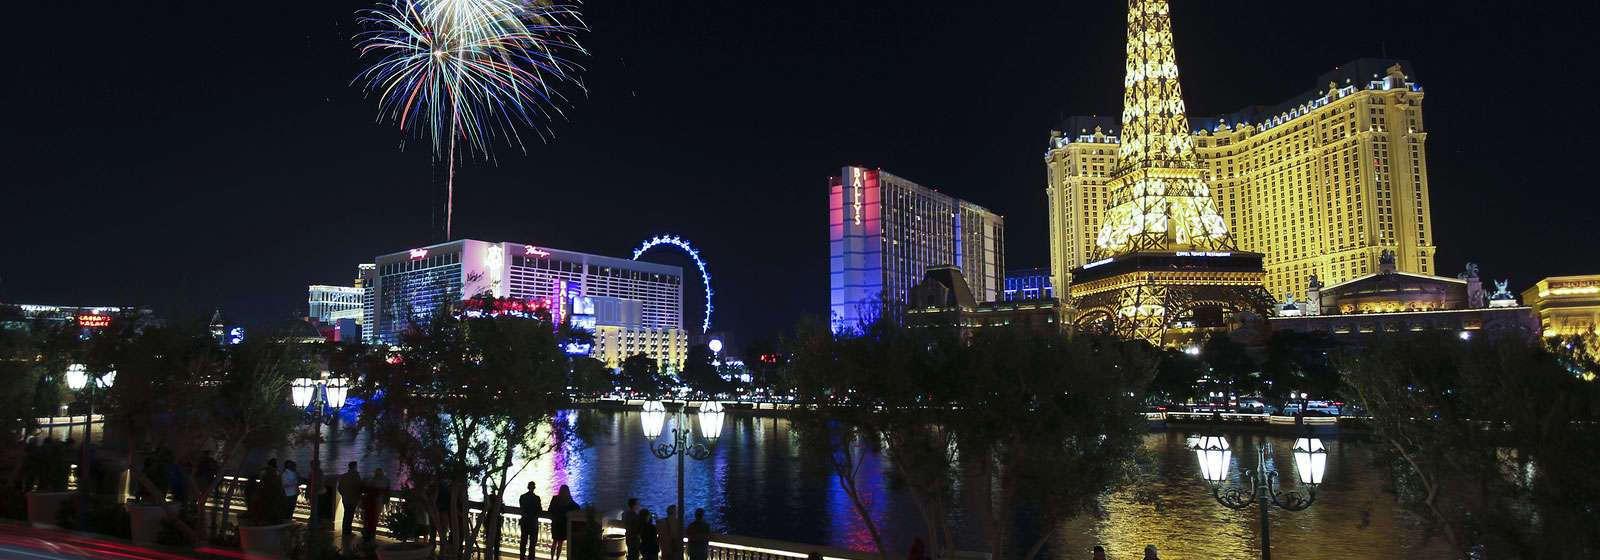 May Calendar Las Vegas : Las vegas july concerts shows events club calendar